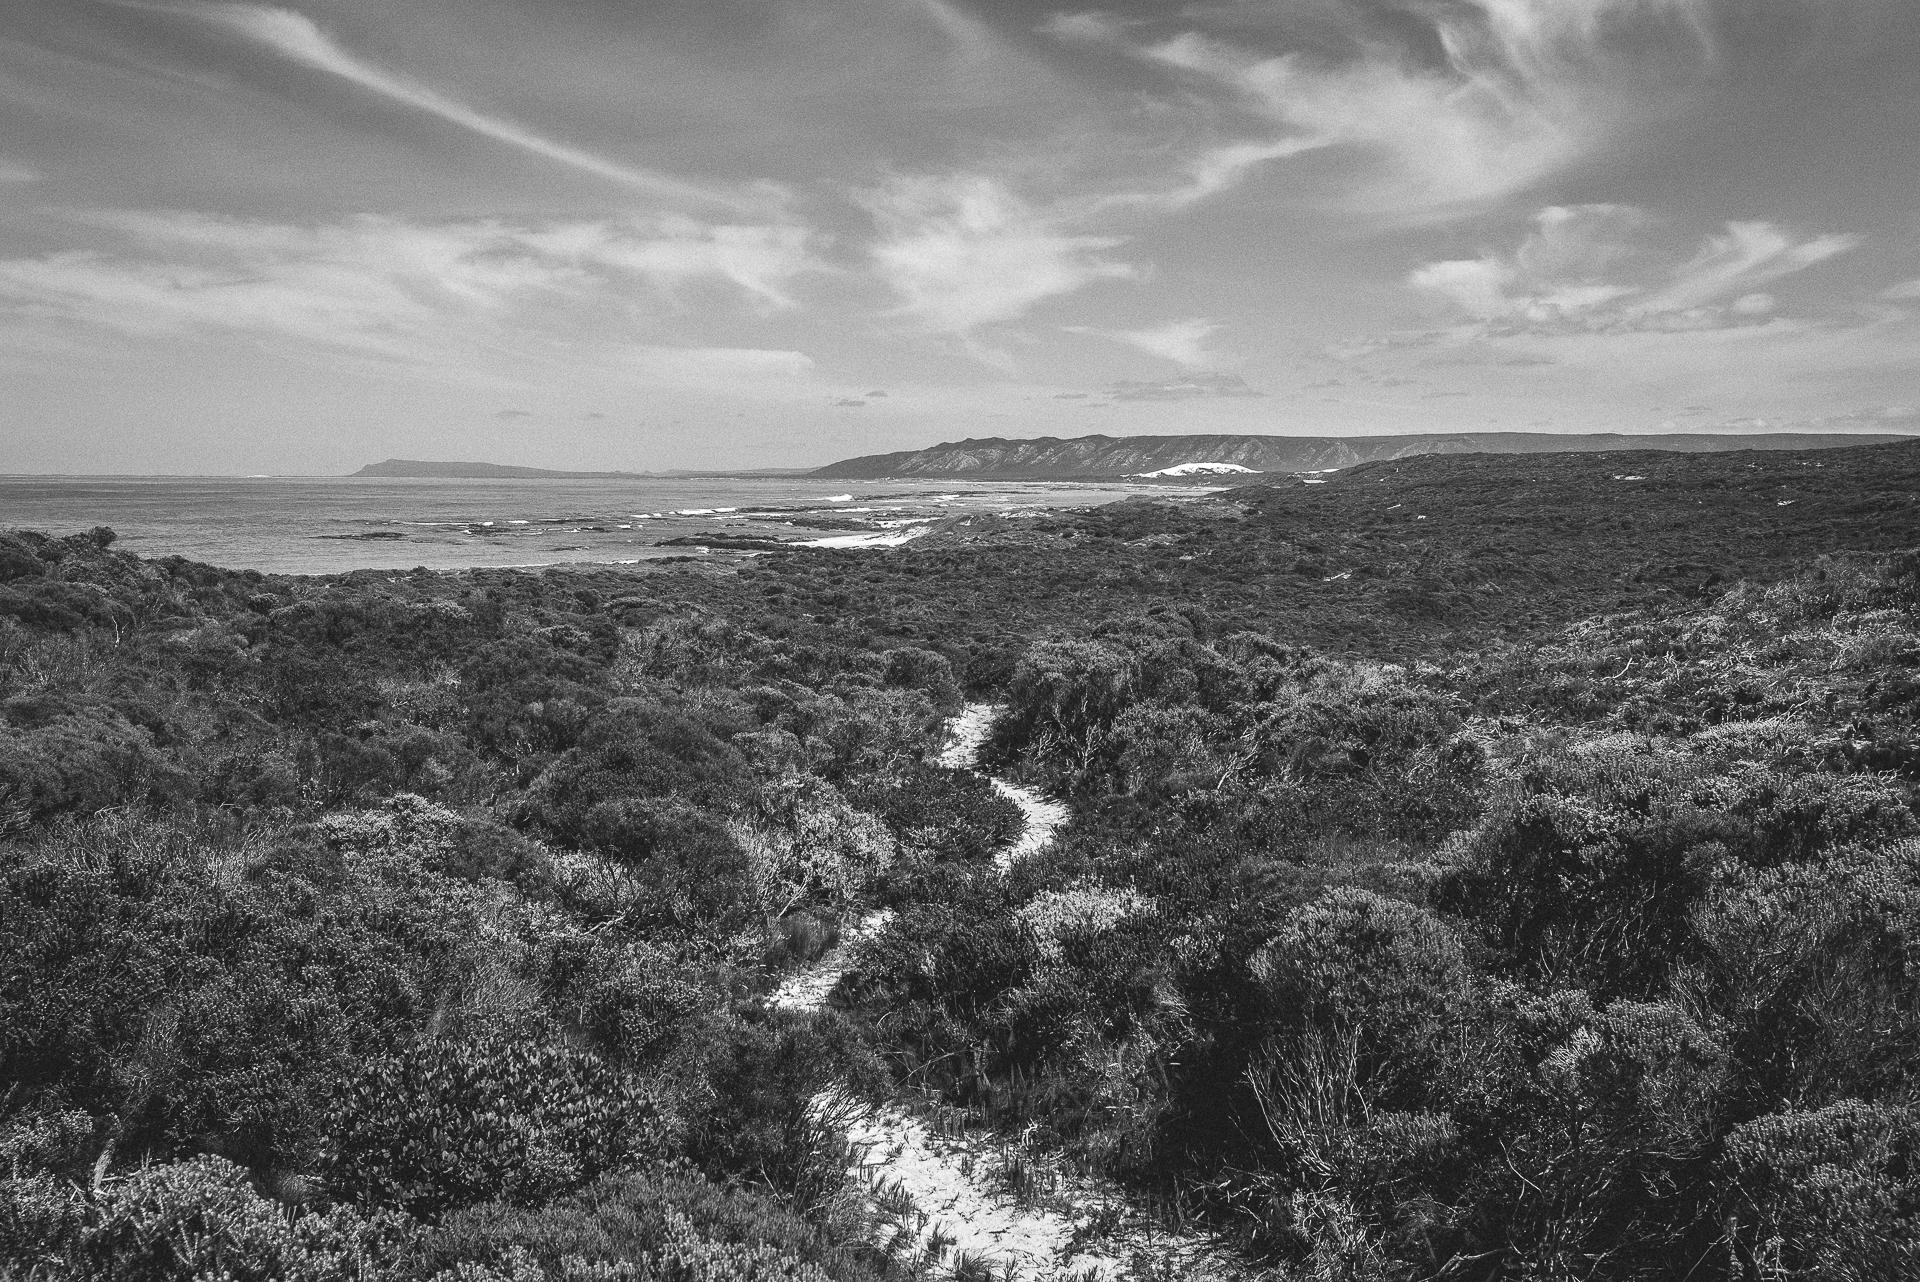 Agulhas National Park, South Africa